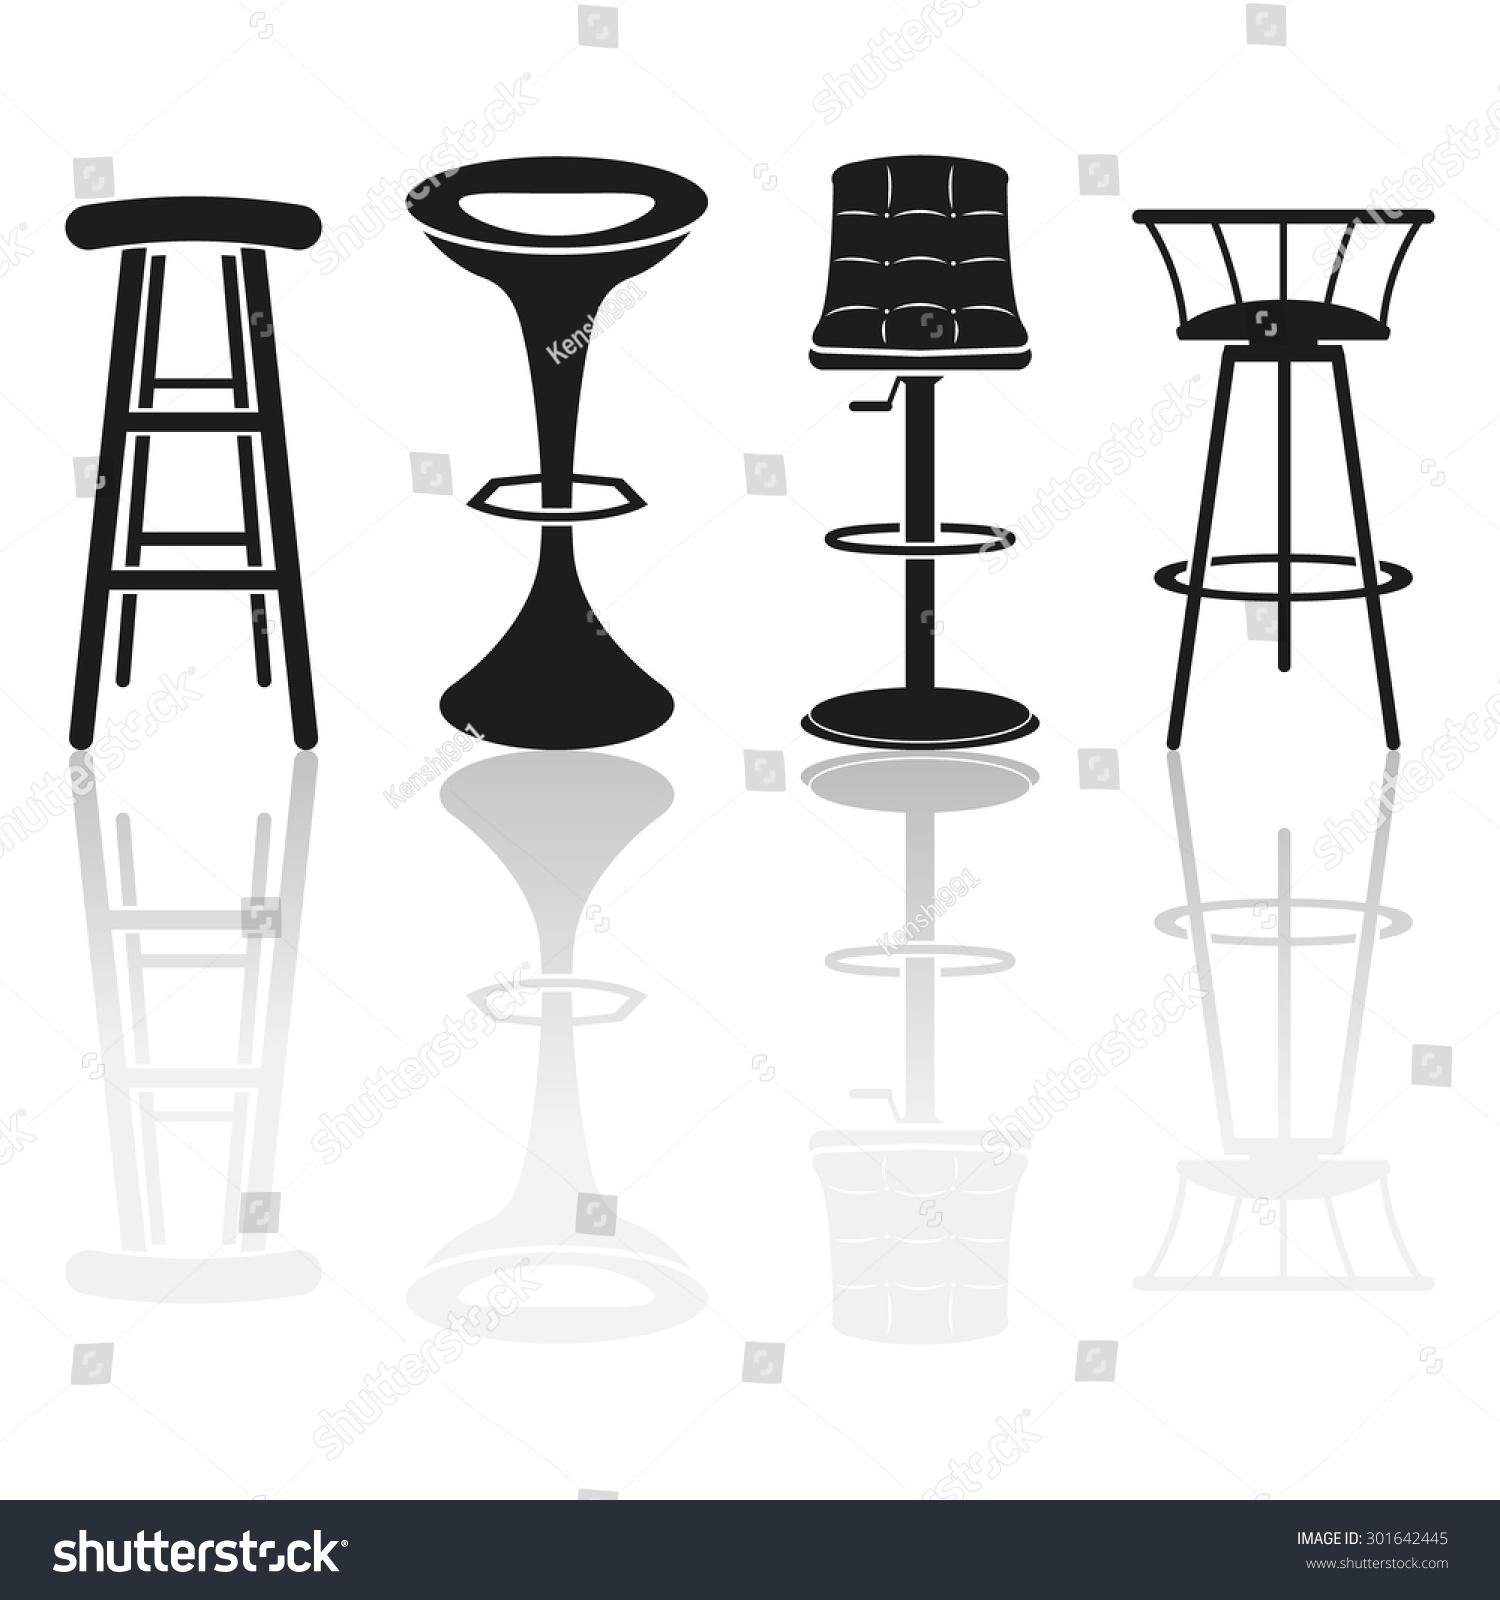 Bar Stool Icons Stock Vector Illustration 301642445  : stock vector bar stool icons 301642445 from www.shutterstock.com size 1500 x 1600 jpeg 242kB